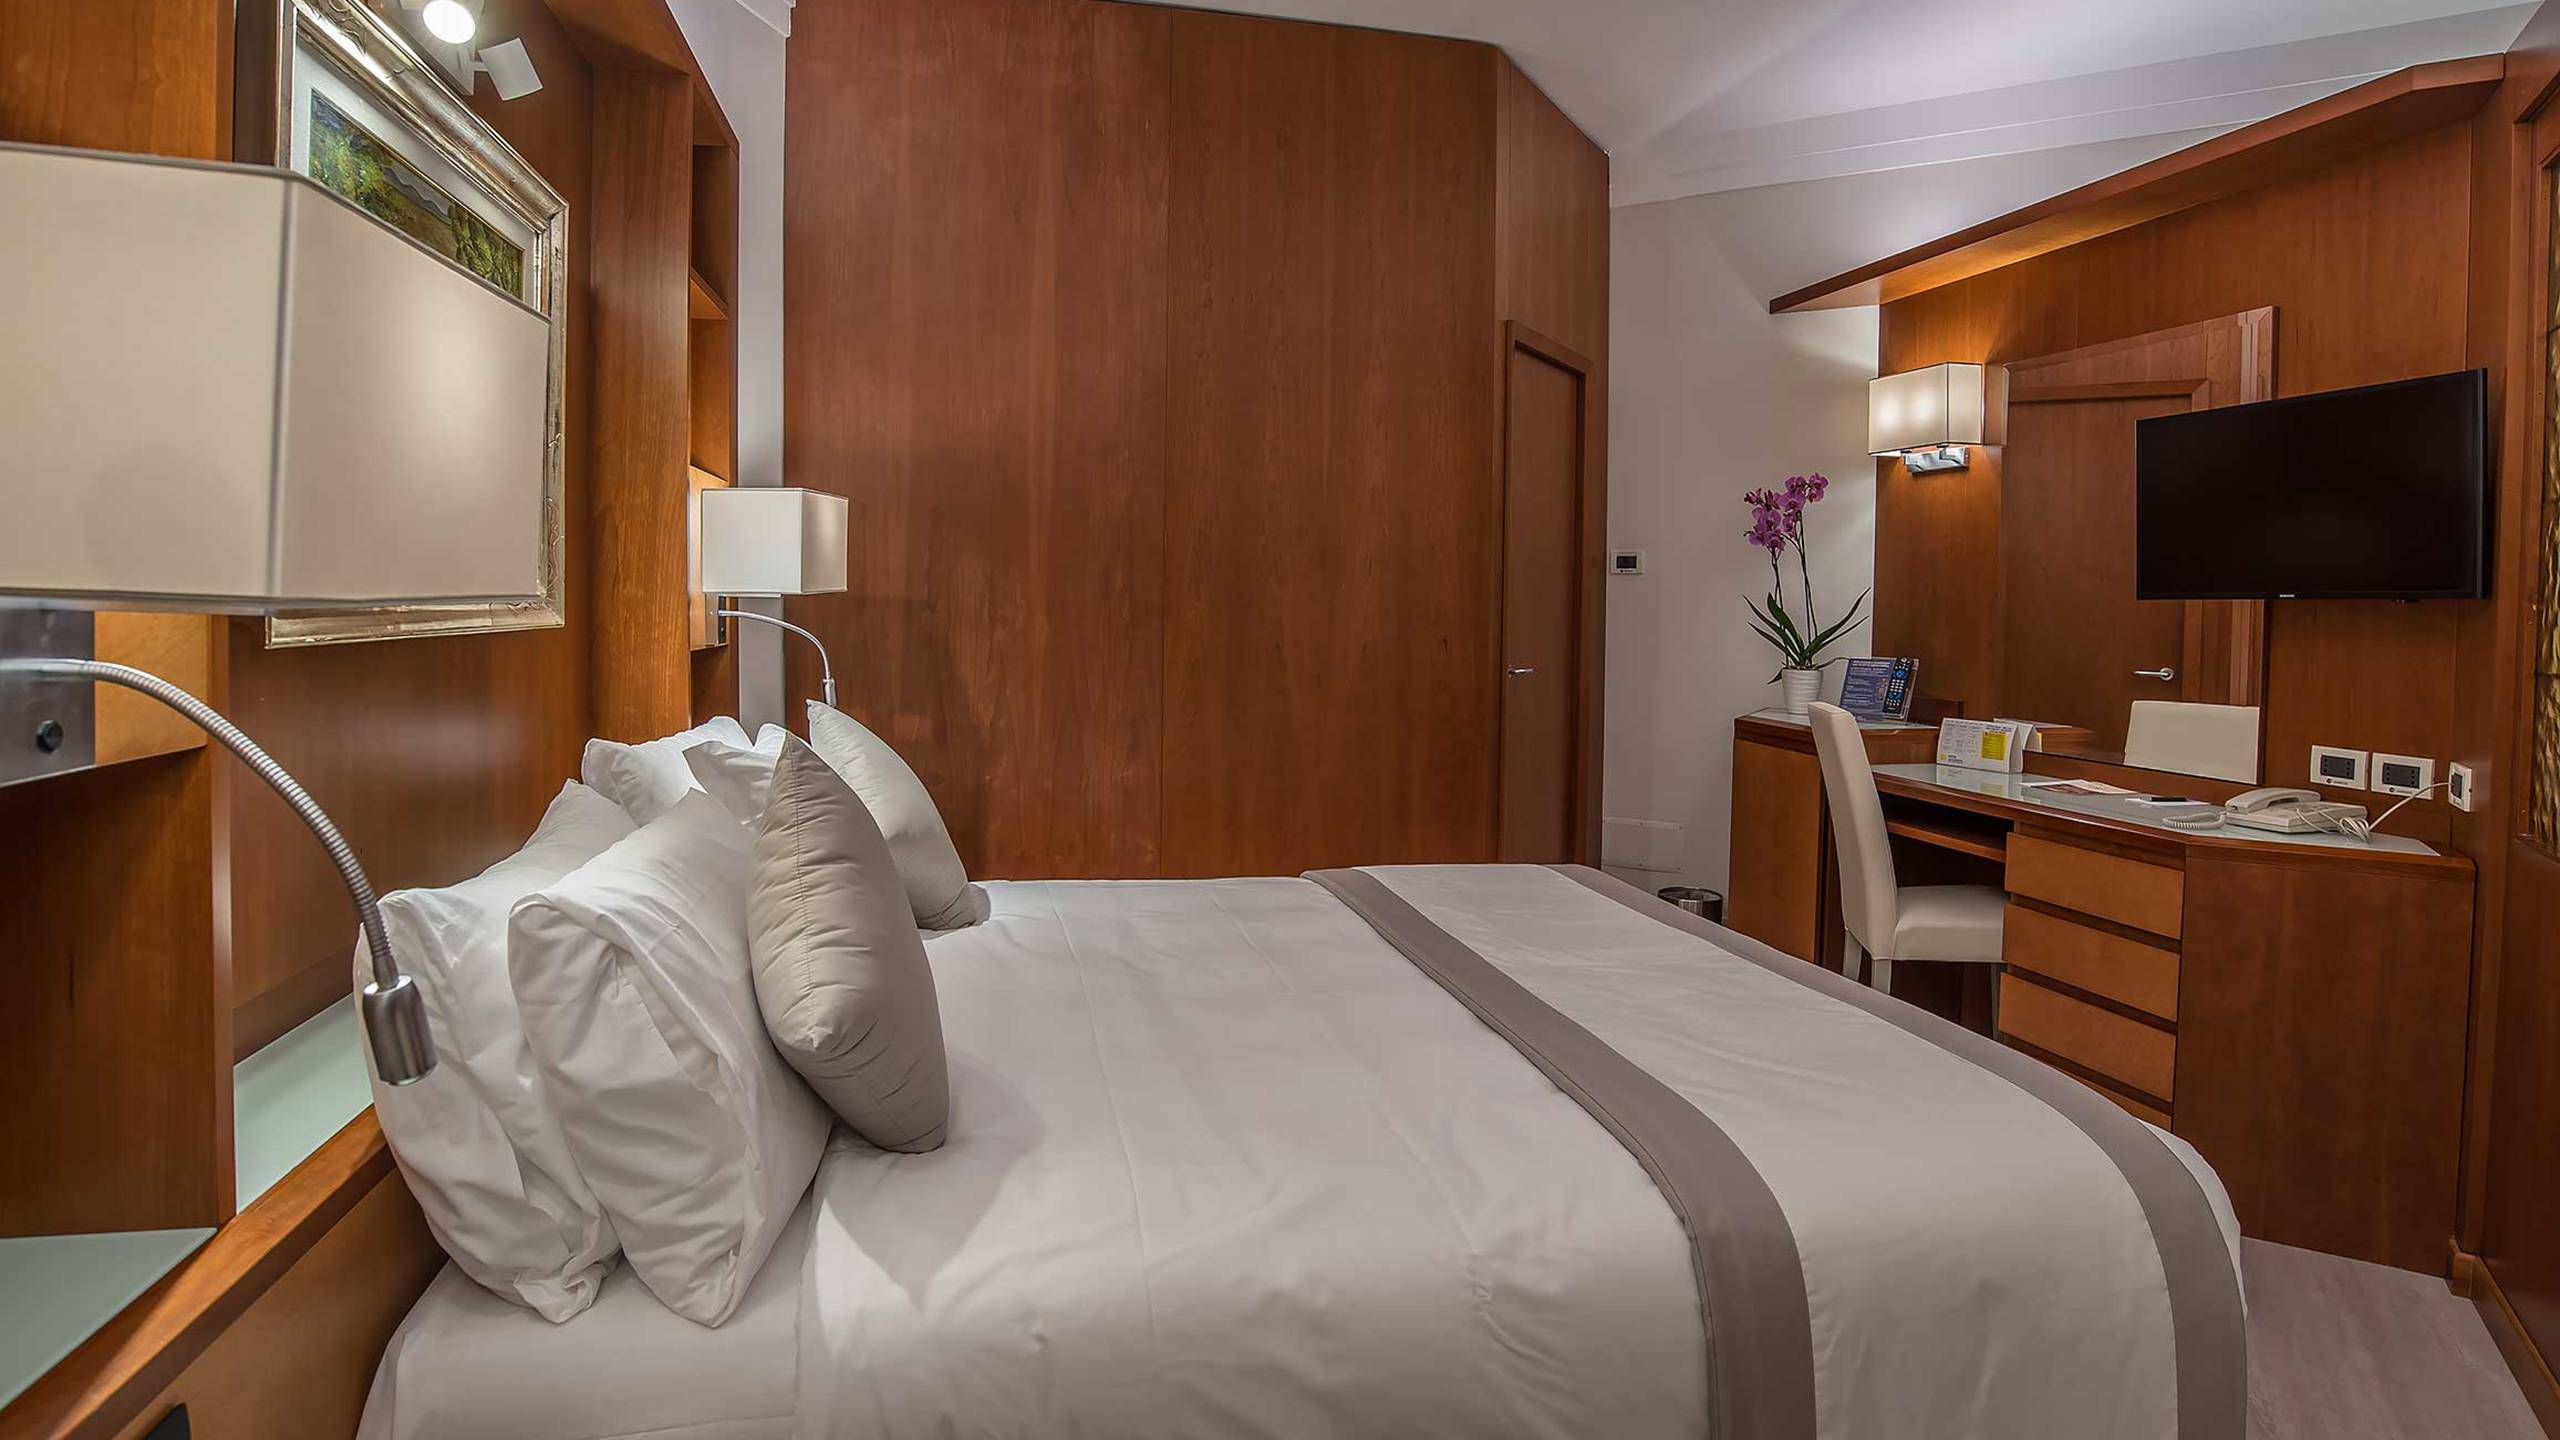 Hotel-La-Giocca-Roma-junior-suite-9